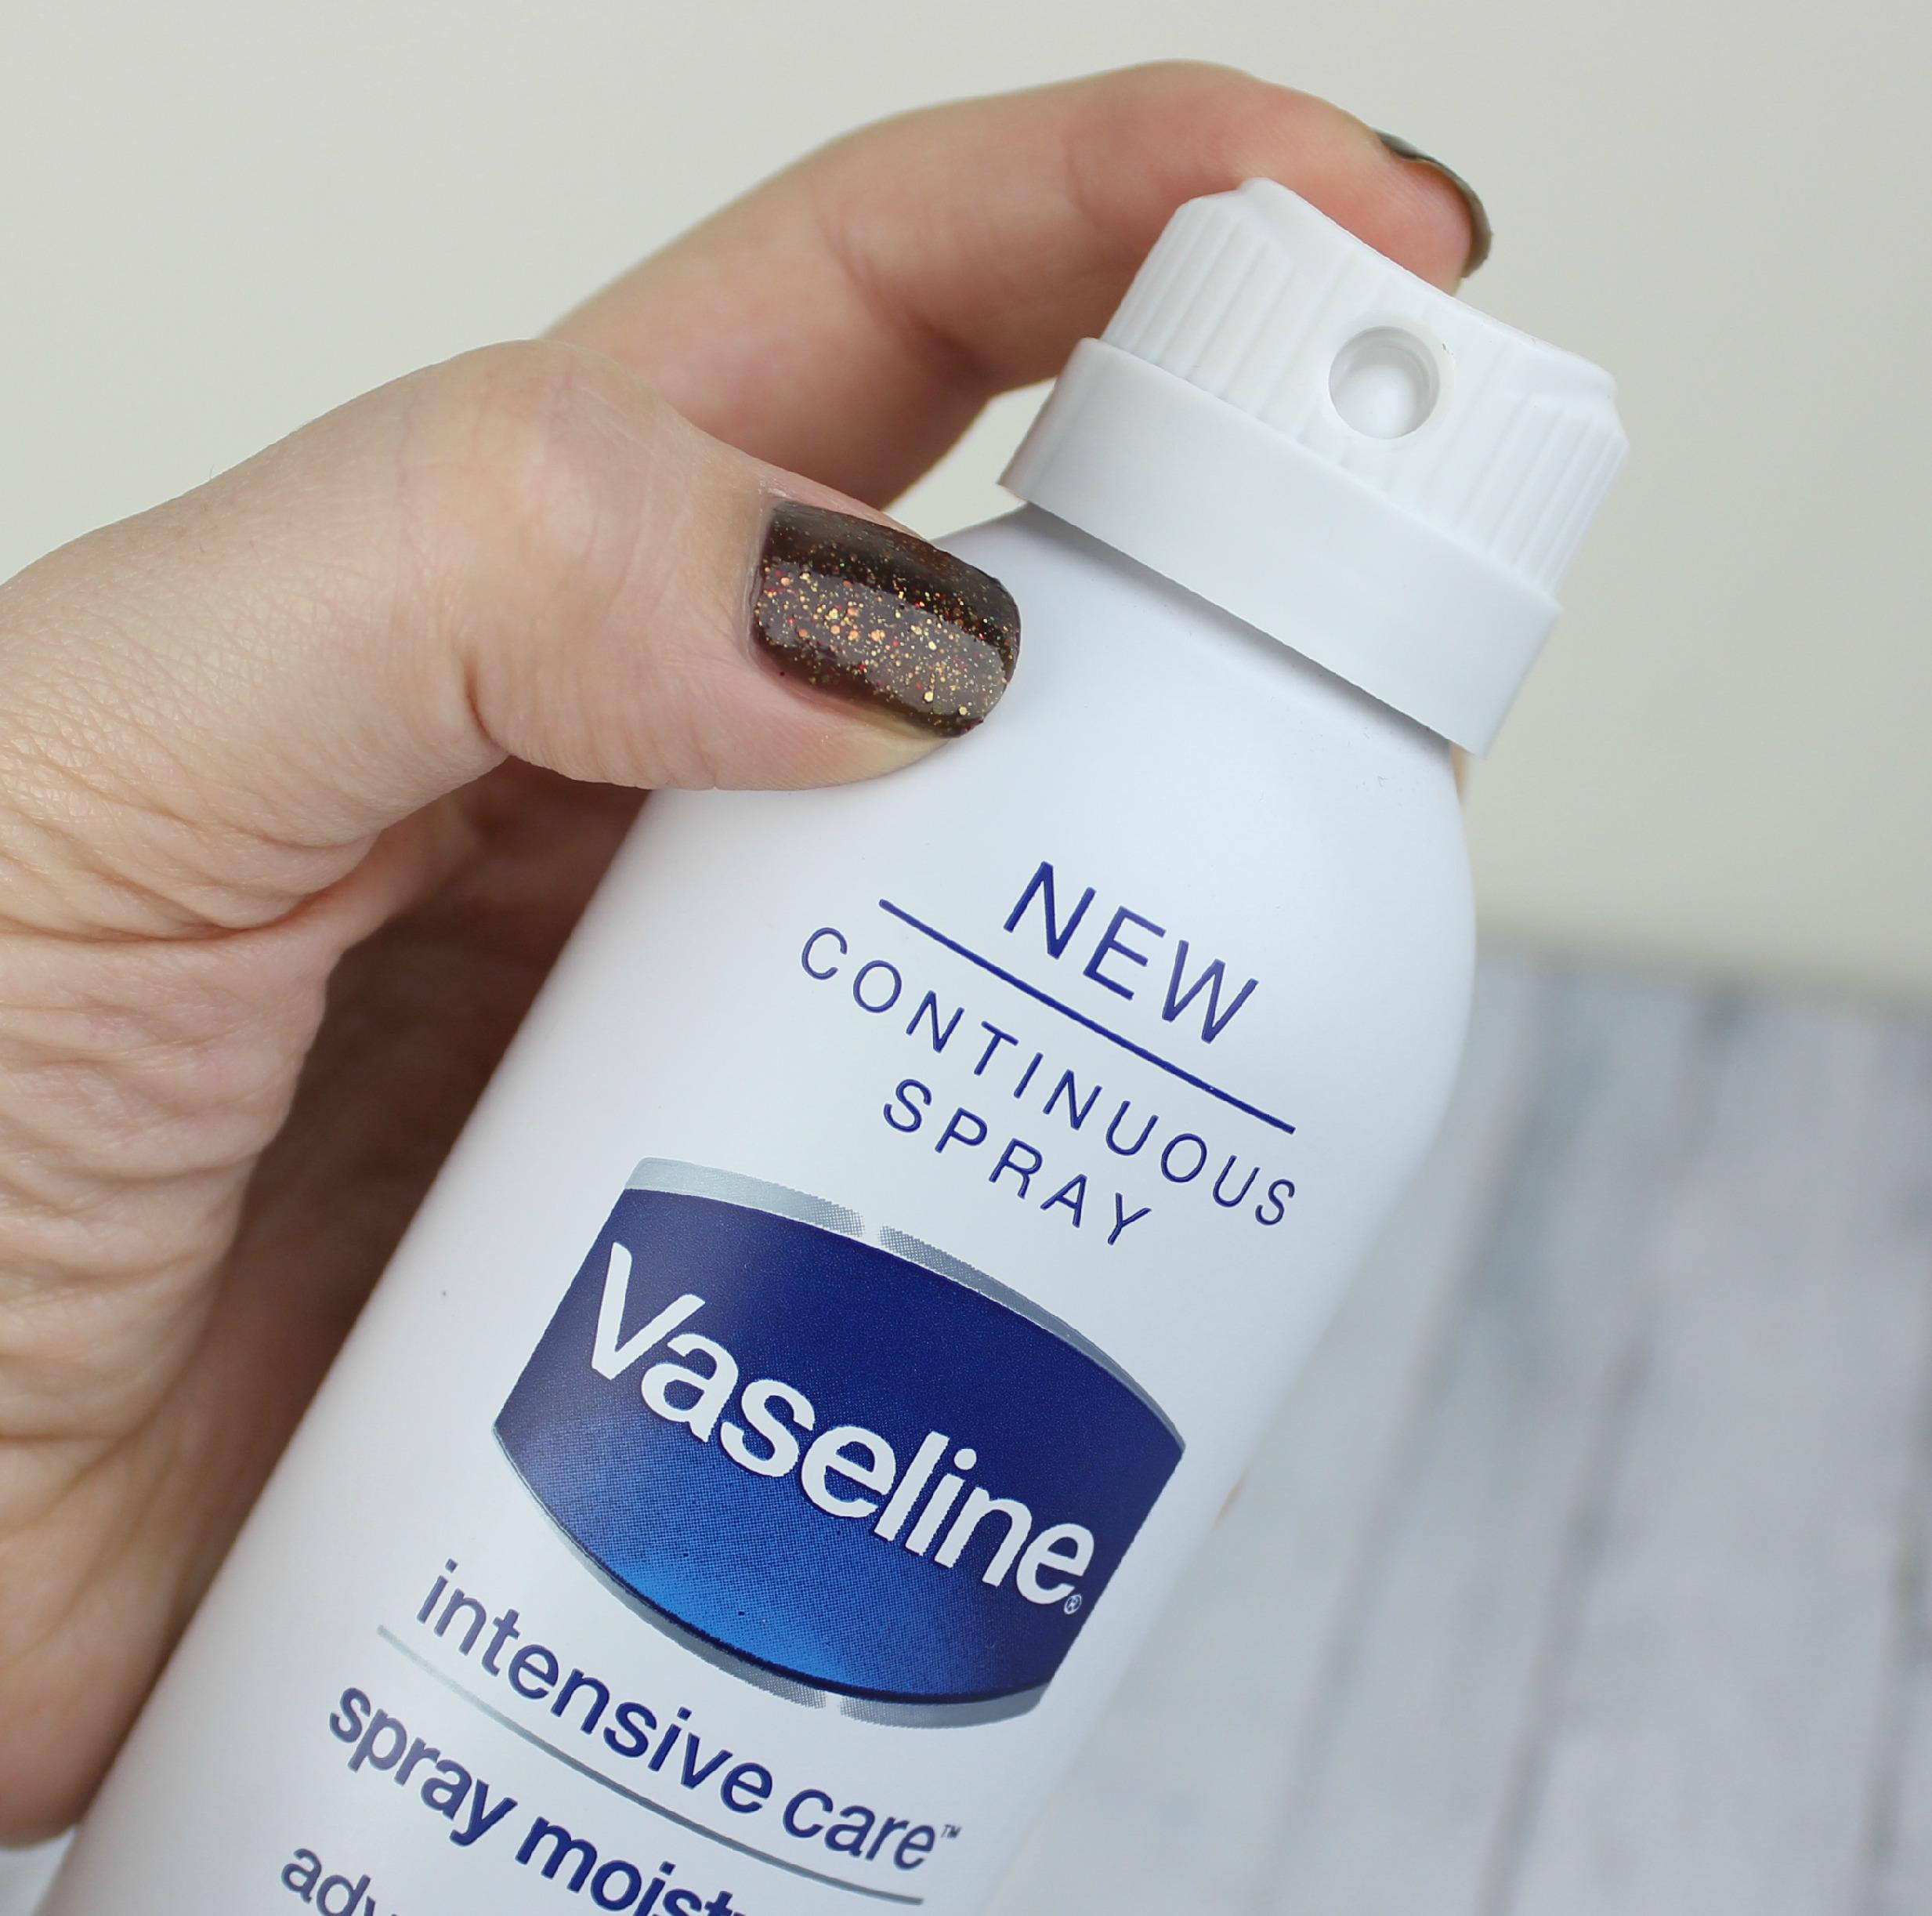 vaseline intensive care